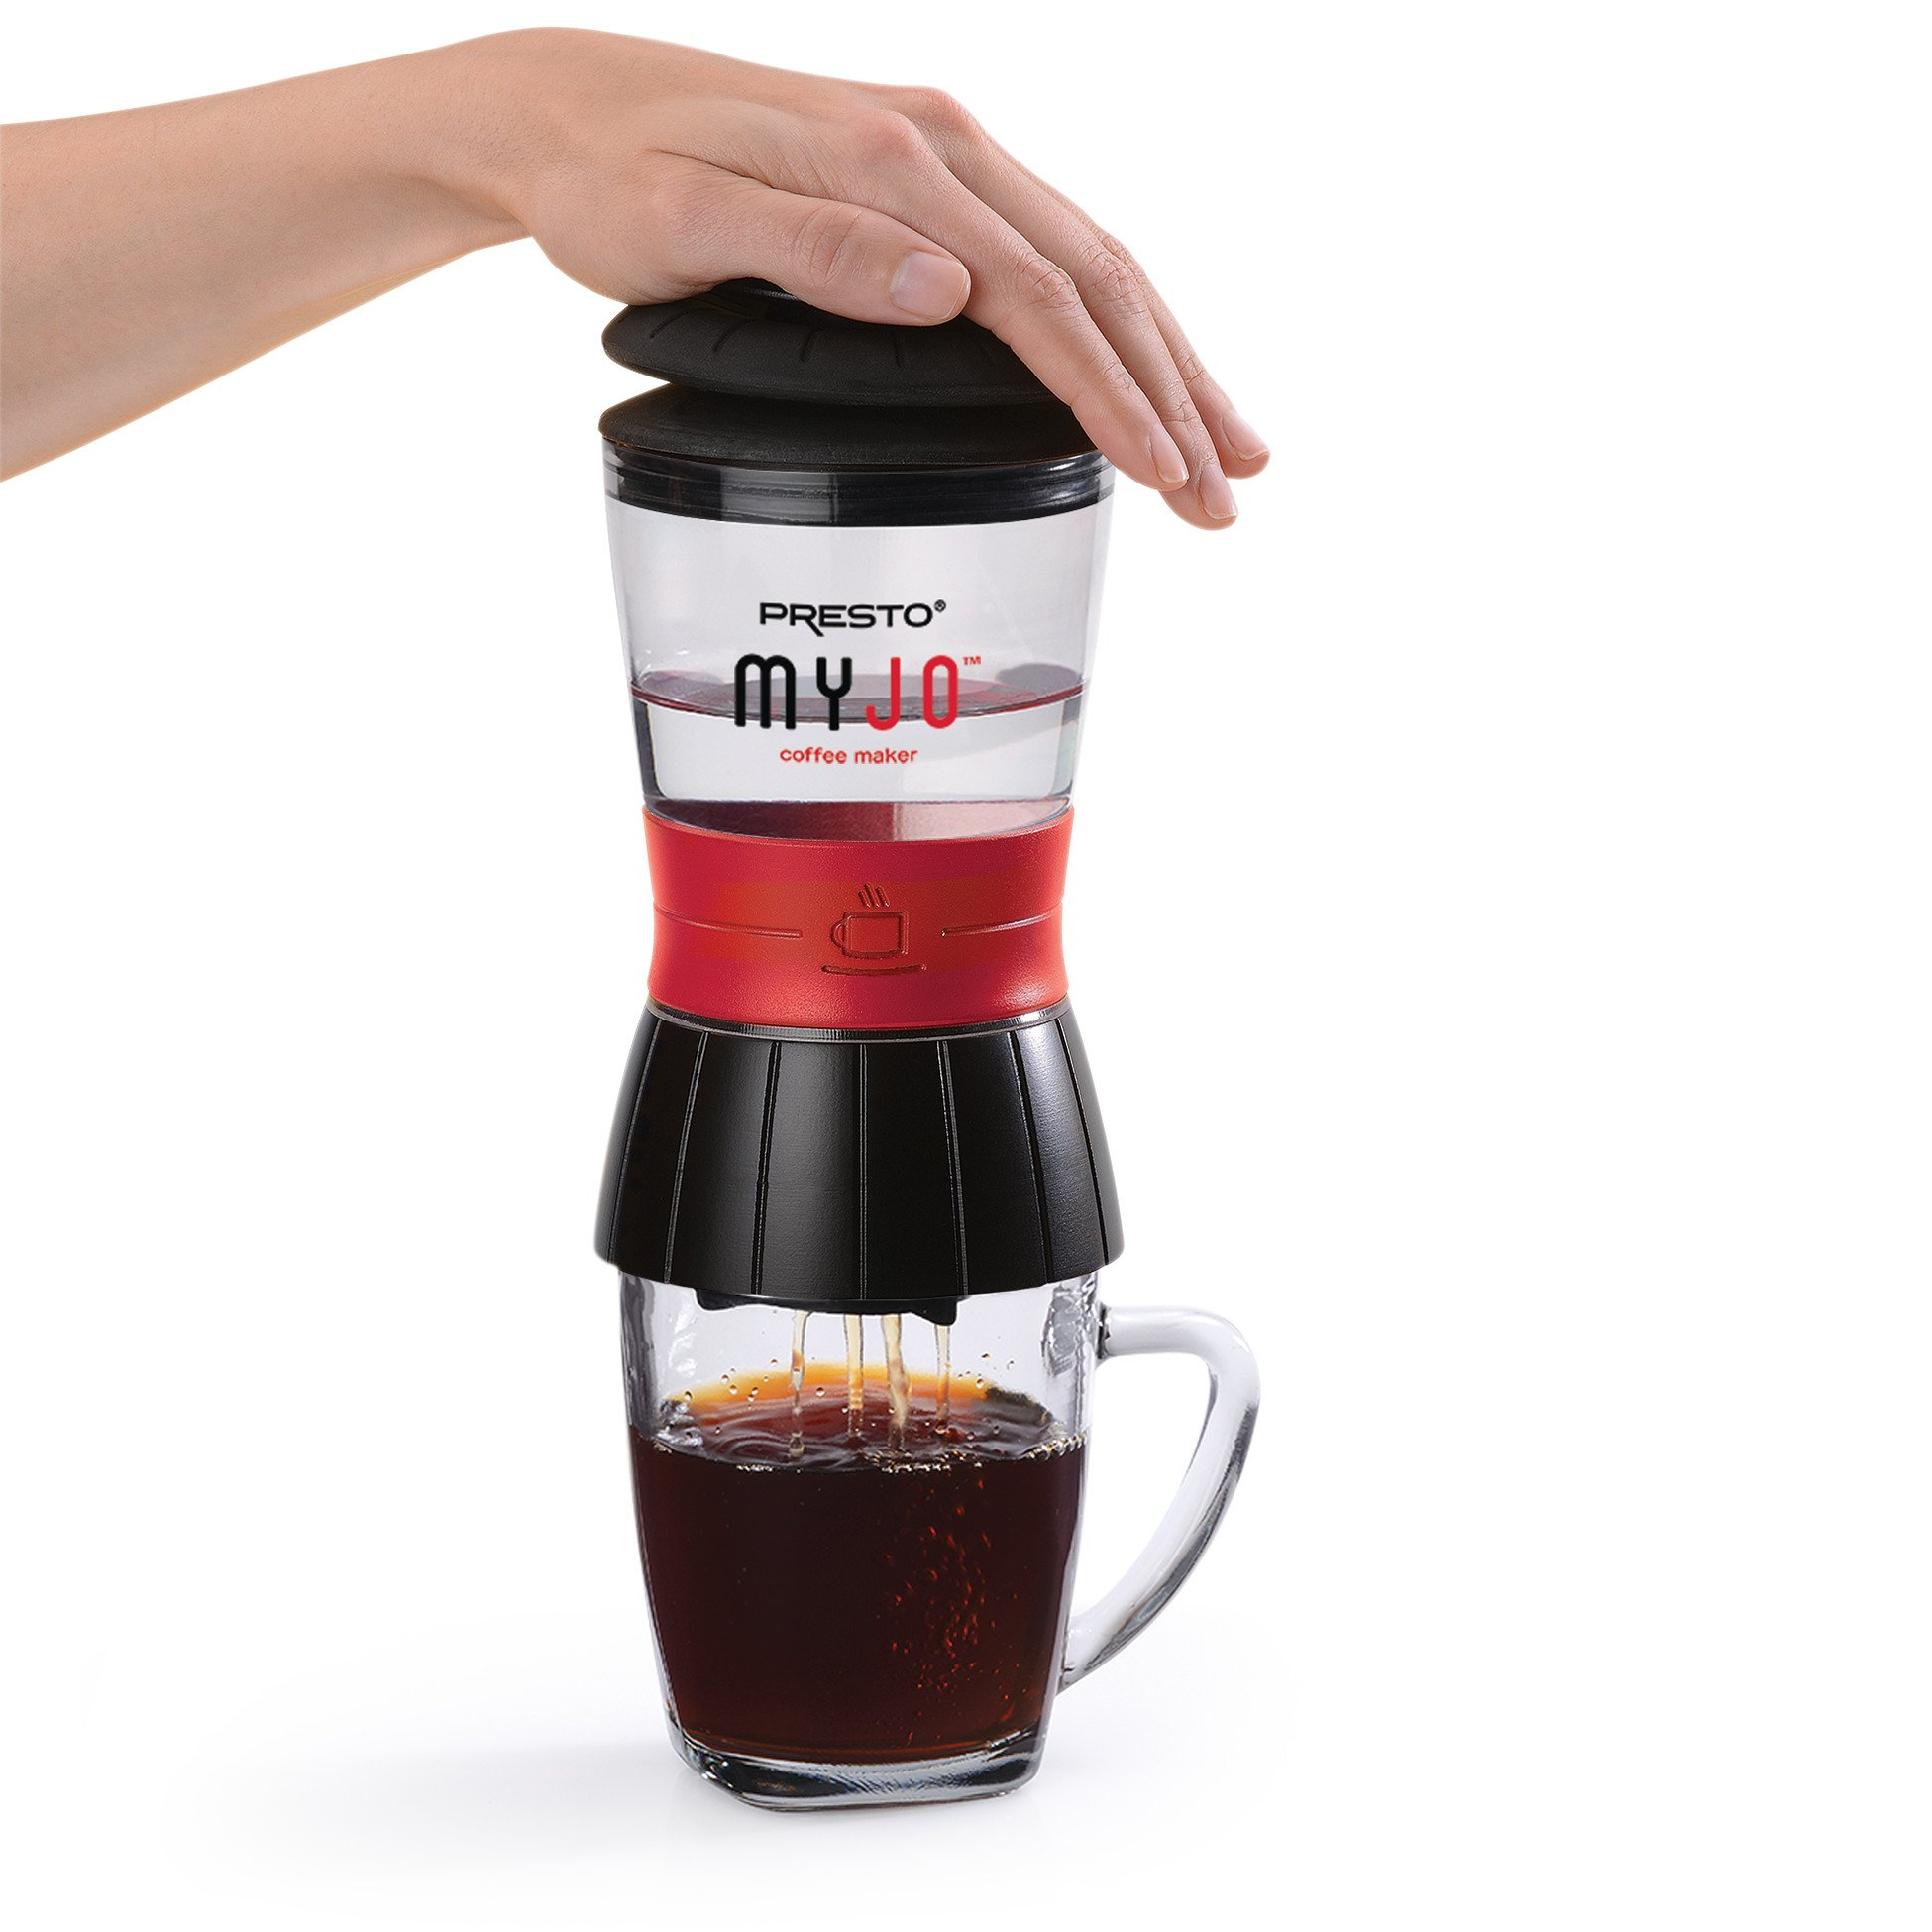 Presto 02835 MyJo Single Cup Coffee Maker by Presto (Image #3)